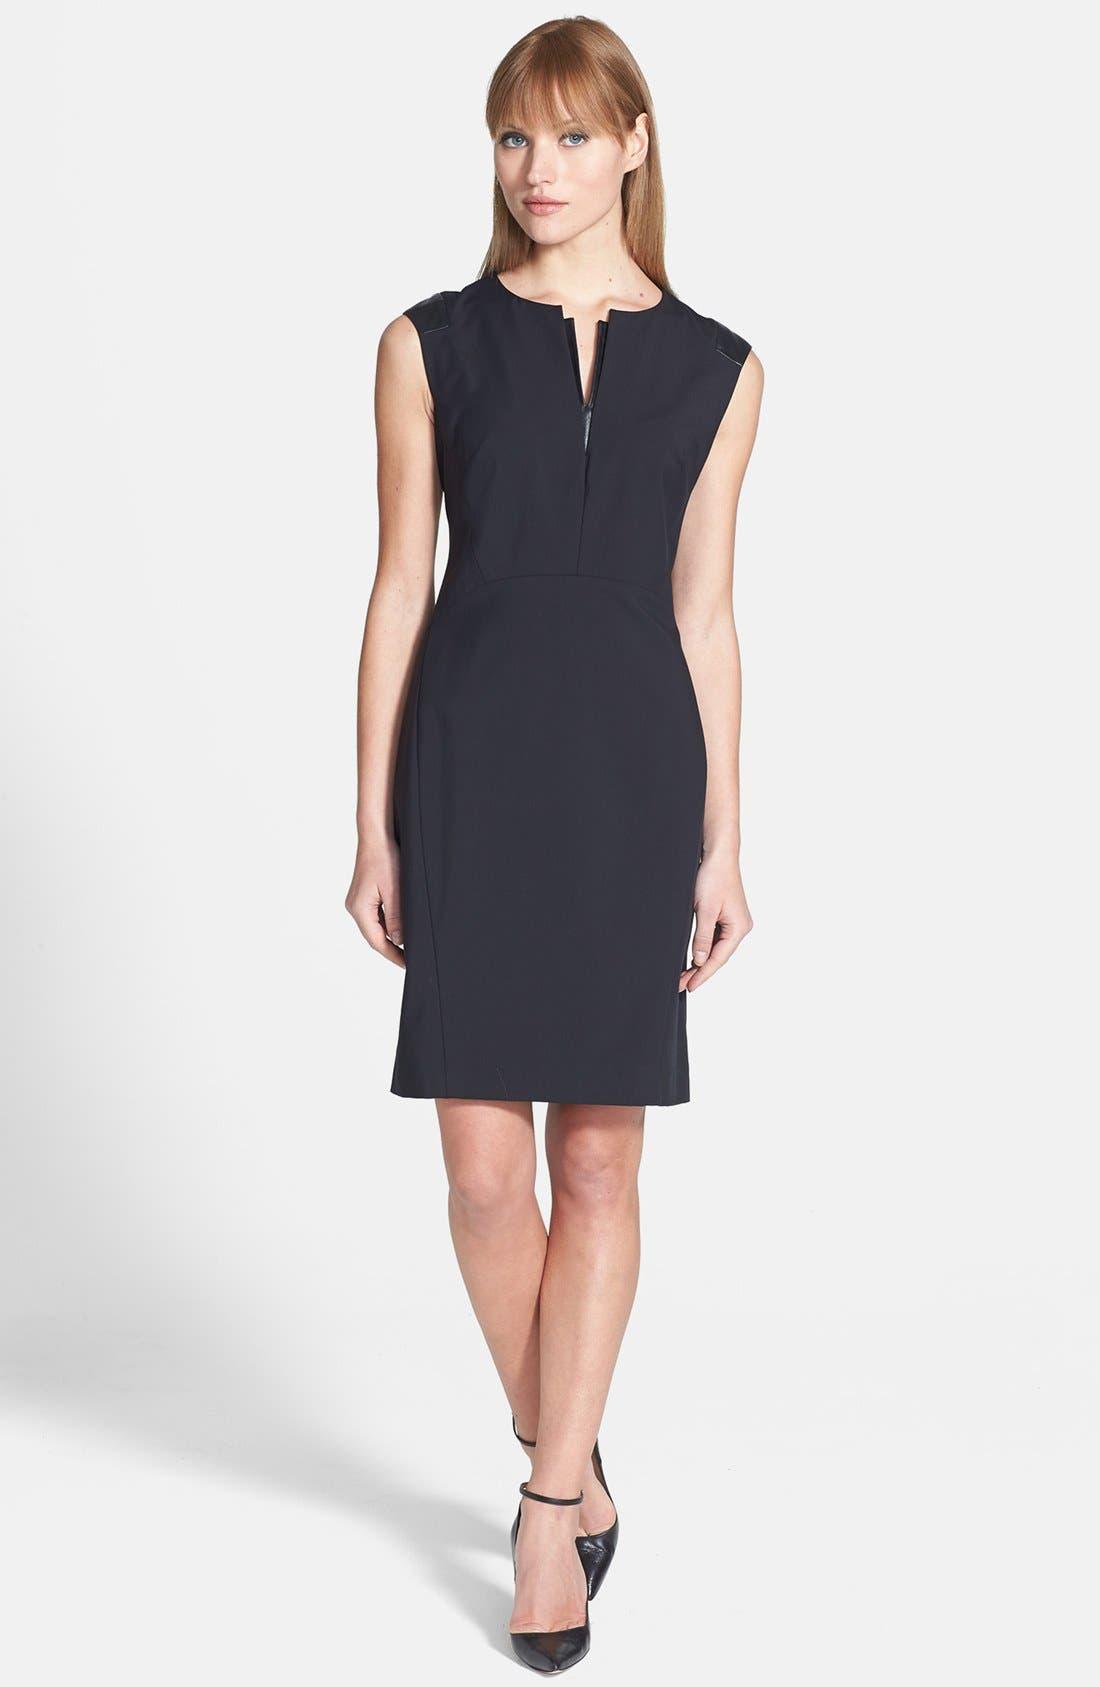 Main Image - Lafayette 148 New York 'Zelina' Stretch Dress with Leather Trim (Regular & Petite)